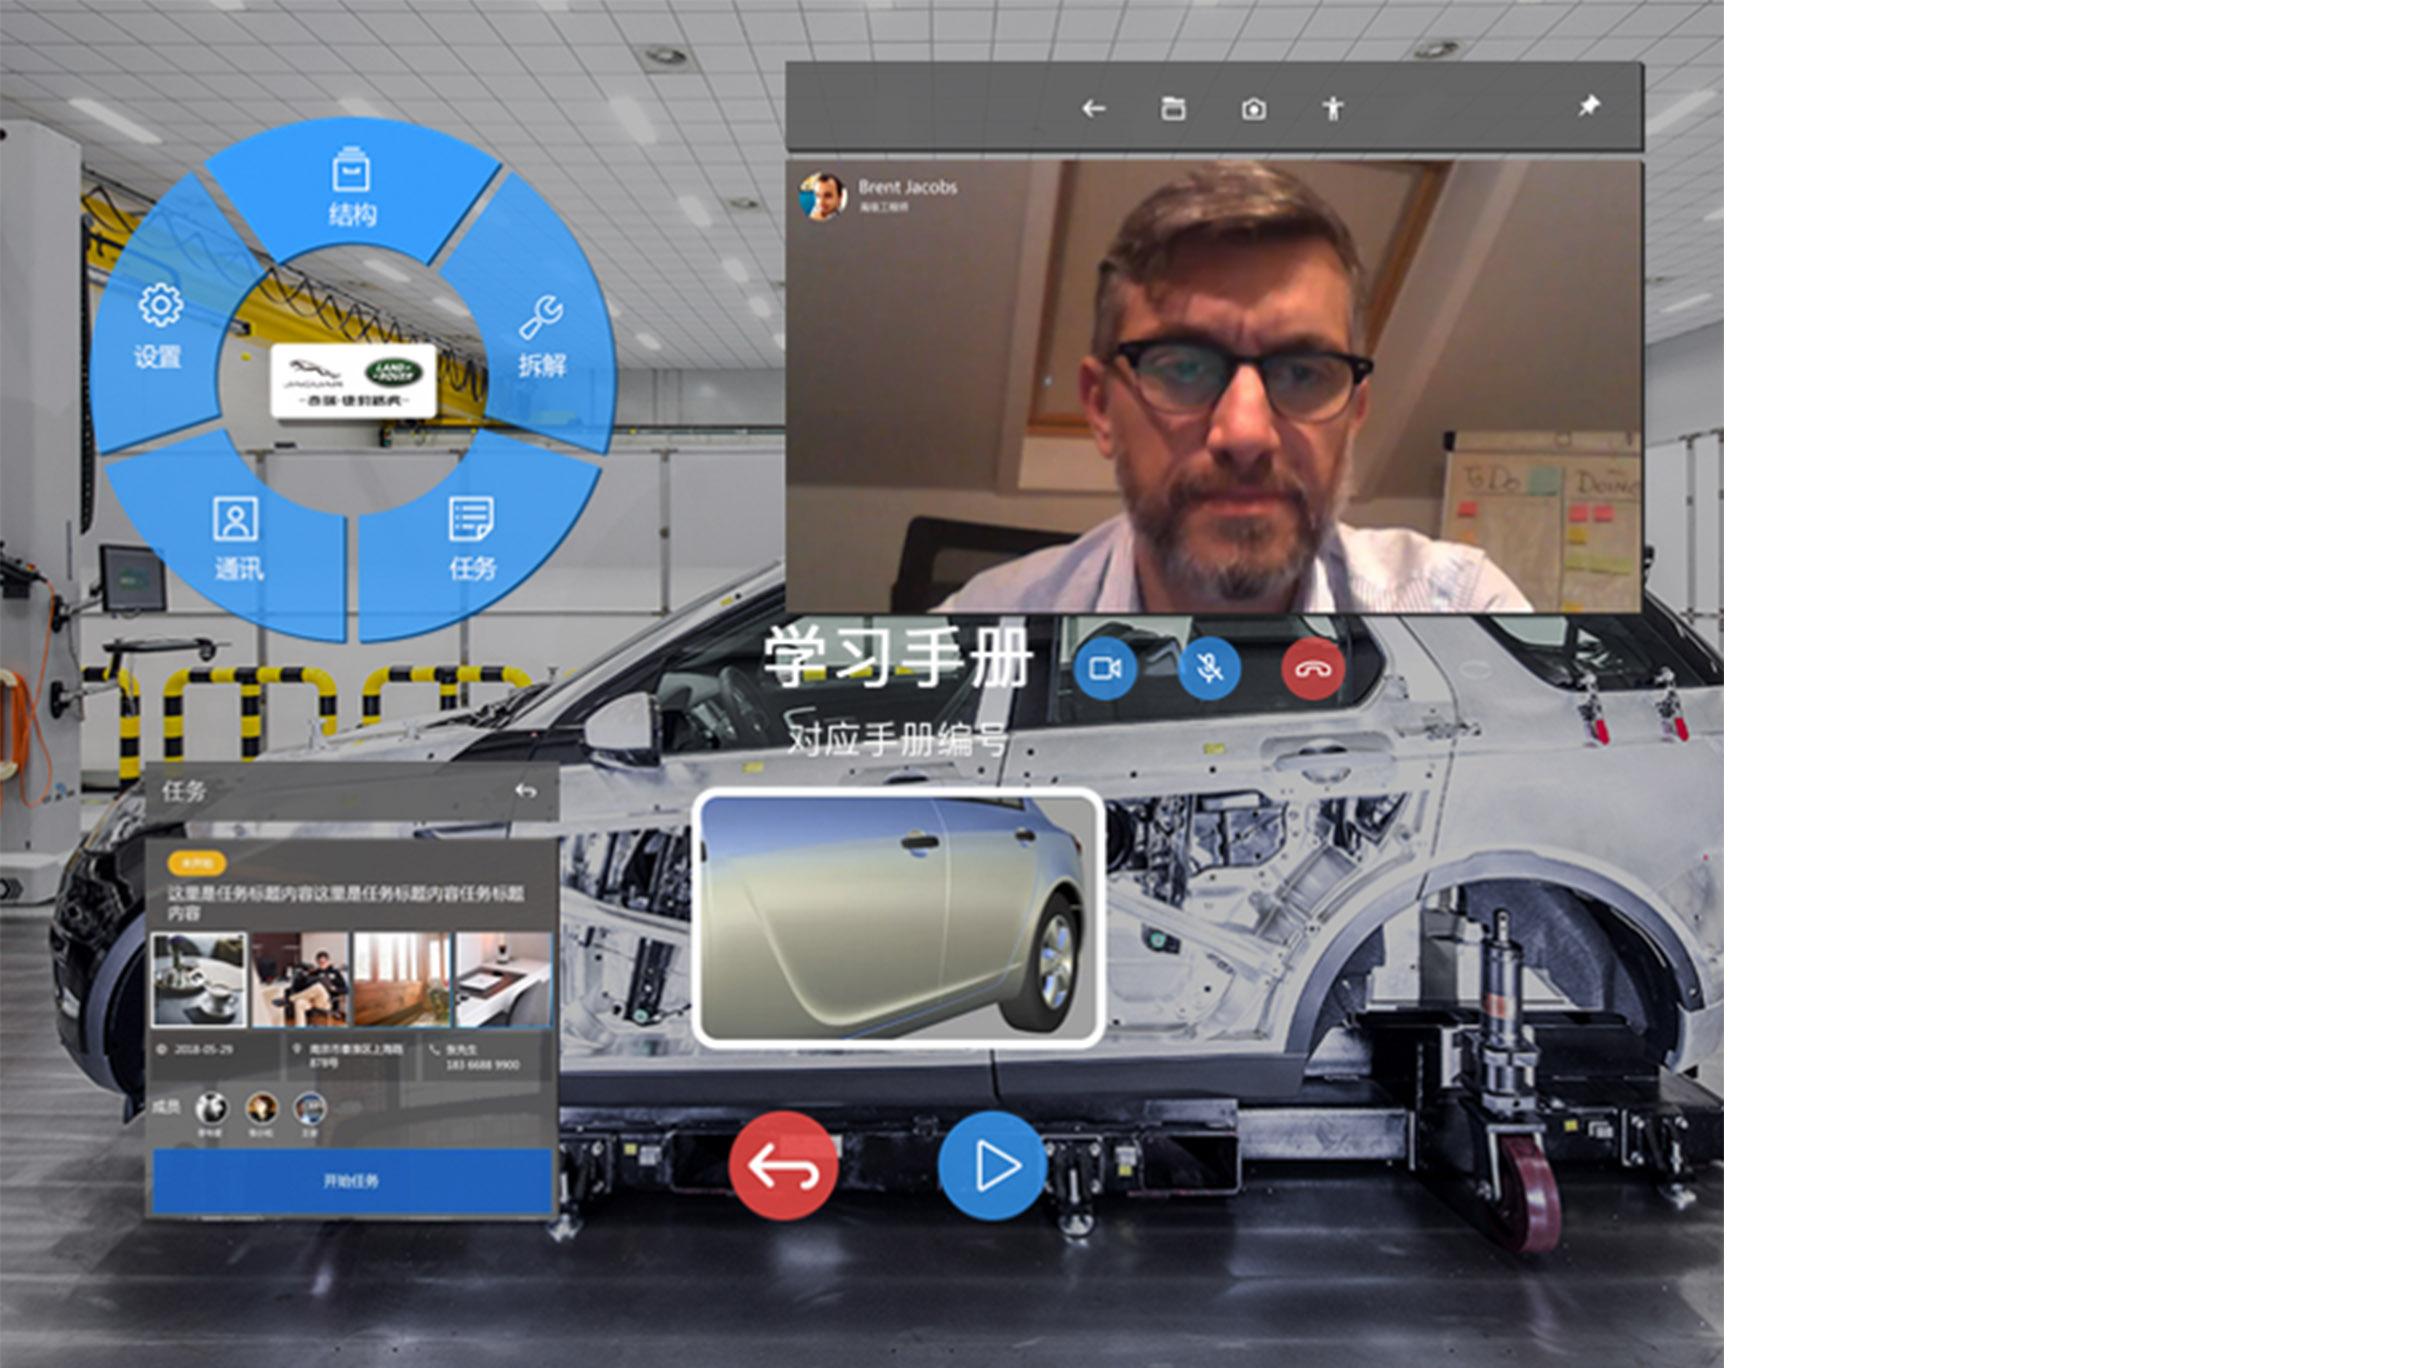 Remote Sharing | Augmented Reality blog | GE Digital